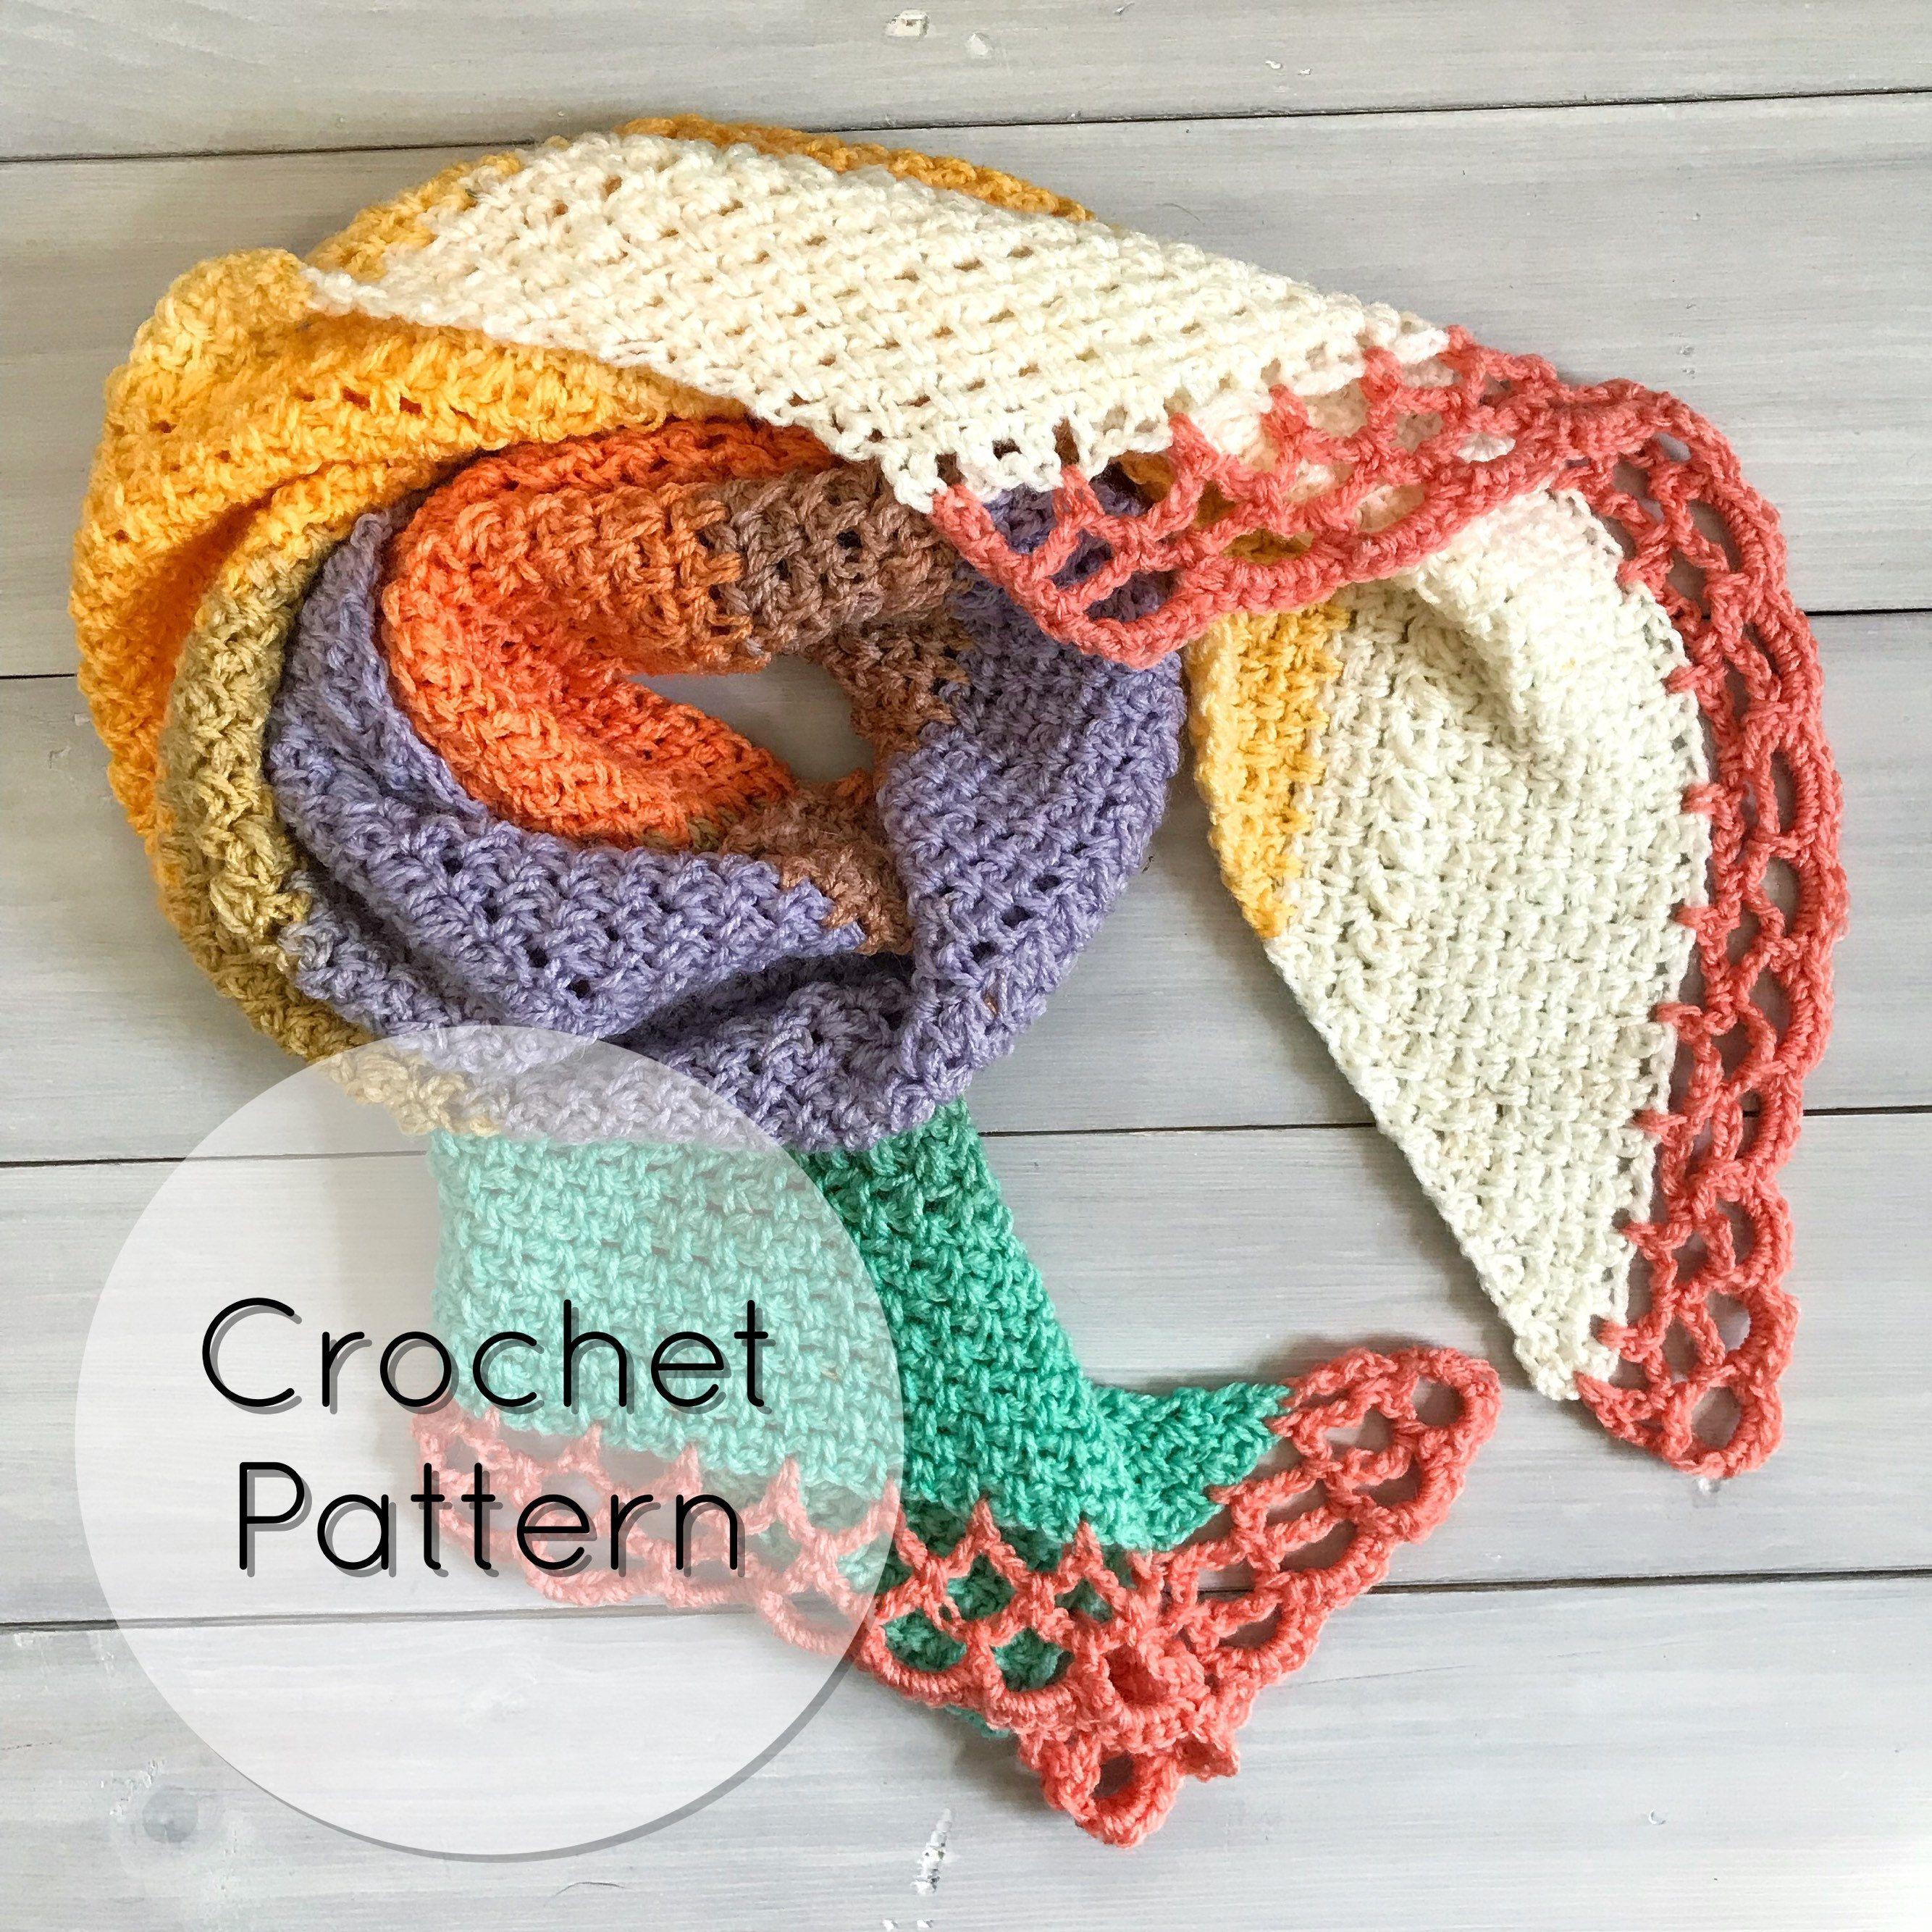 Stitch Works Software Great Chart Making App For Crochet Crochet Diagram Crochet Techniques Crochet Instructions